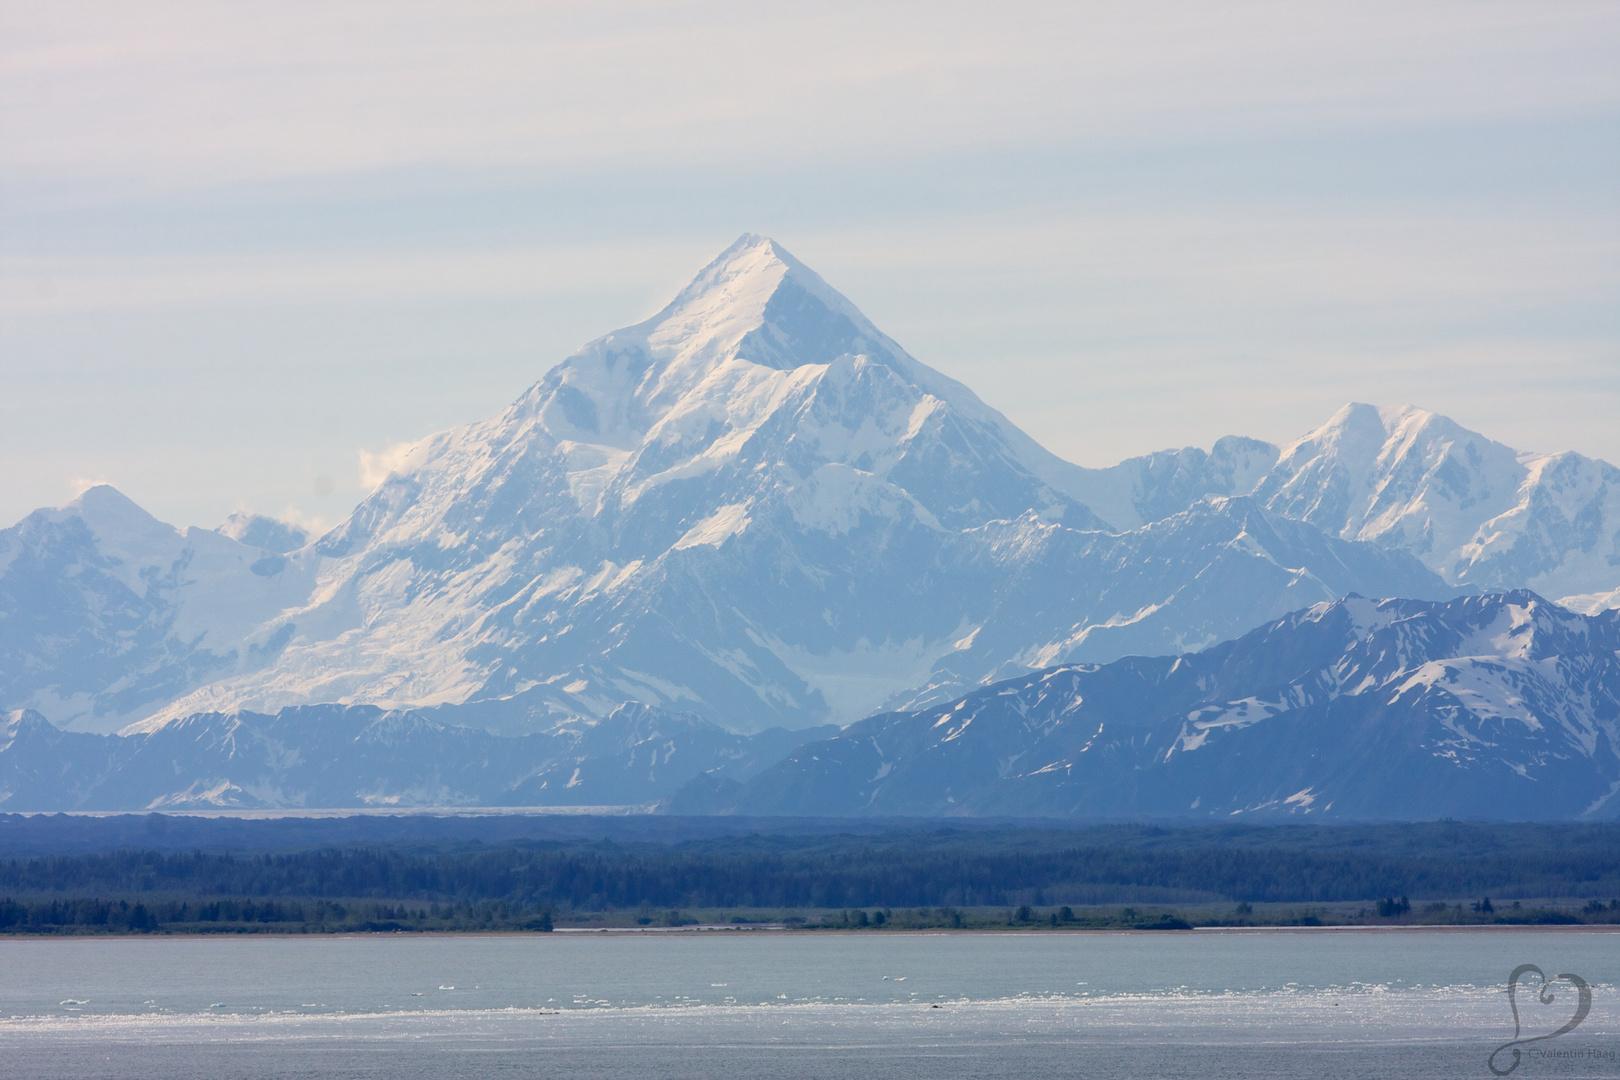 Mount St. Elias, Icy Bay photo & image | Nature, Landscape ...